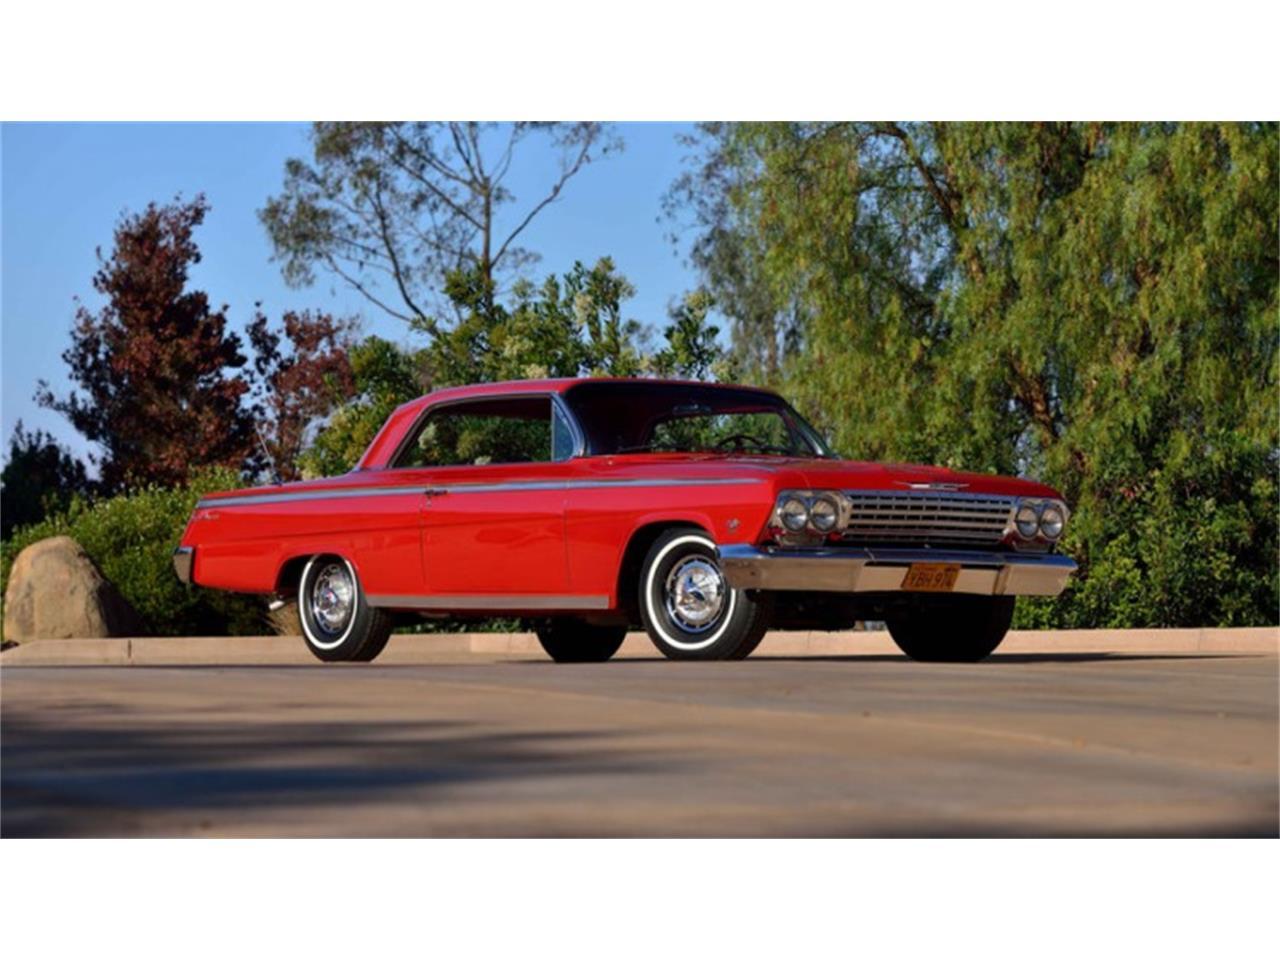 1962 Chevrolet Impala (CC-1233643) for sale in Sparks, Nevada